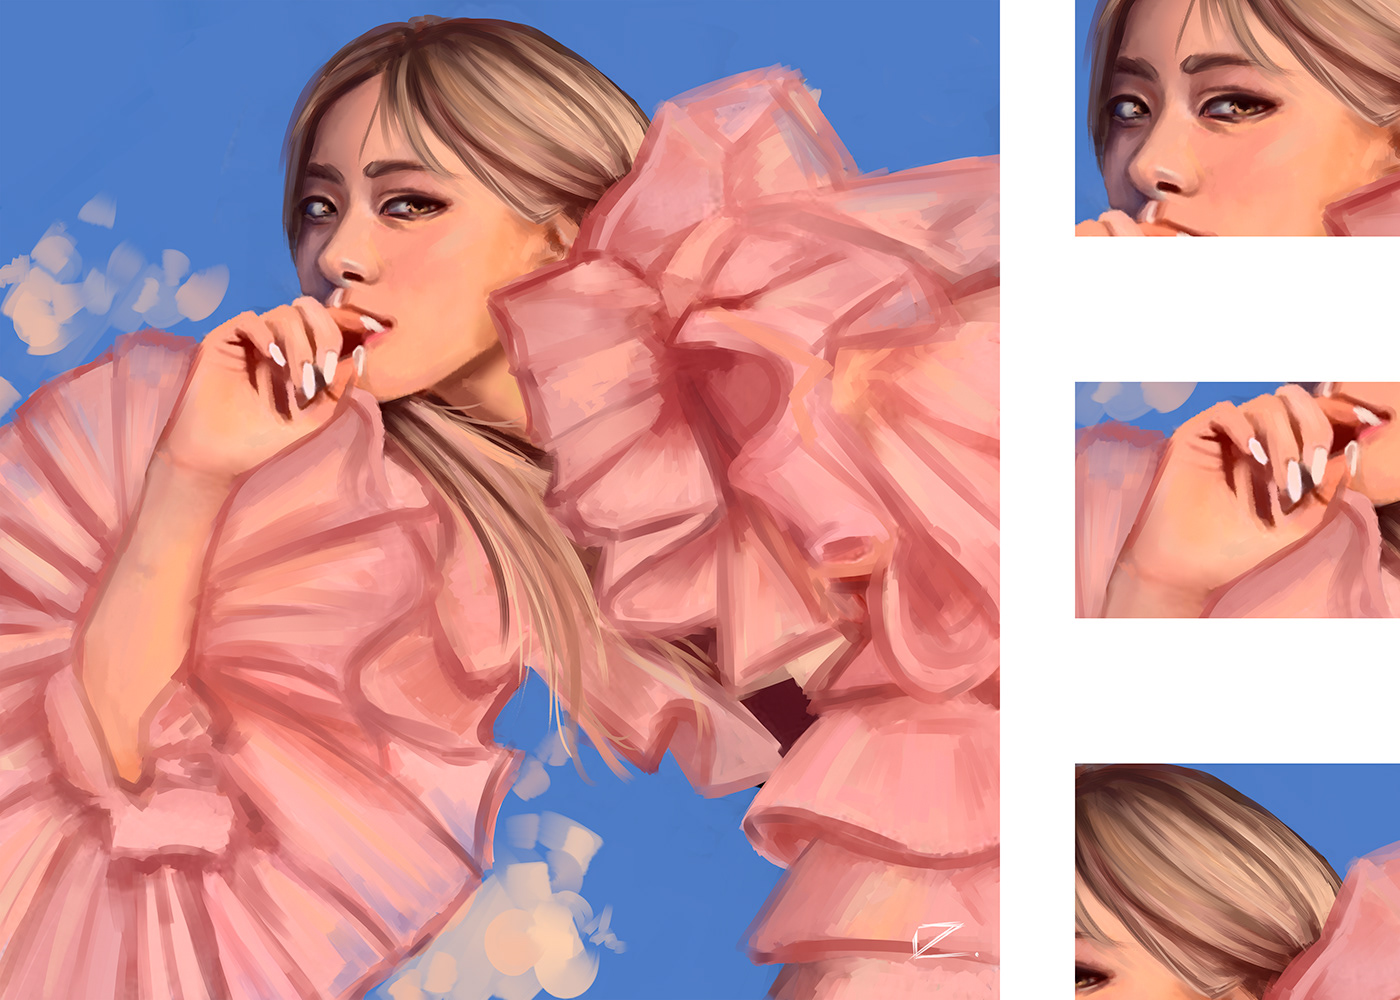 conceptart digitalart face ILLUSTRATION  painting   people photoshop portrait sketch vector